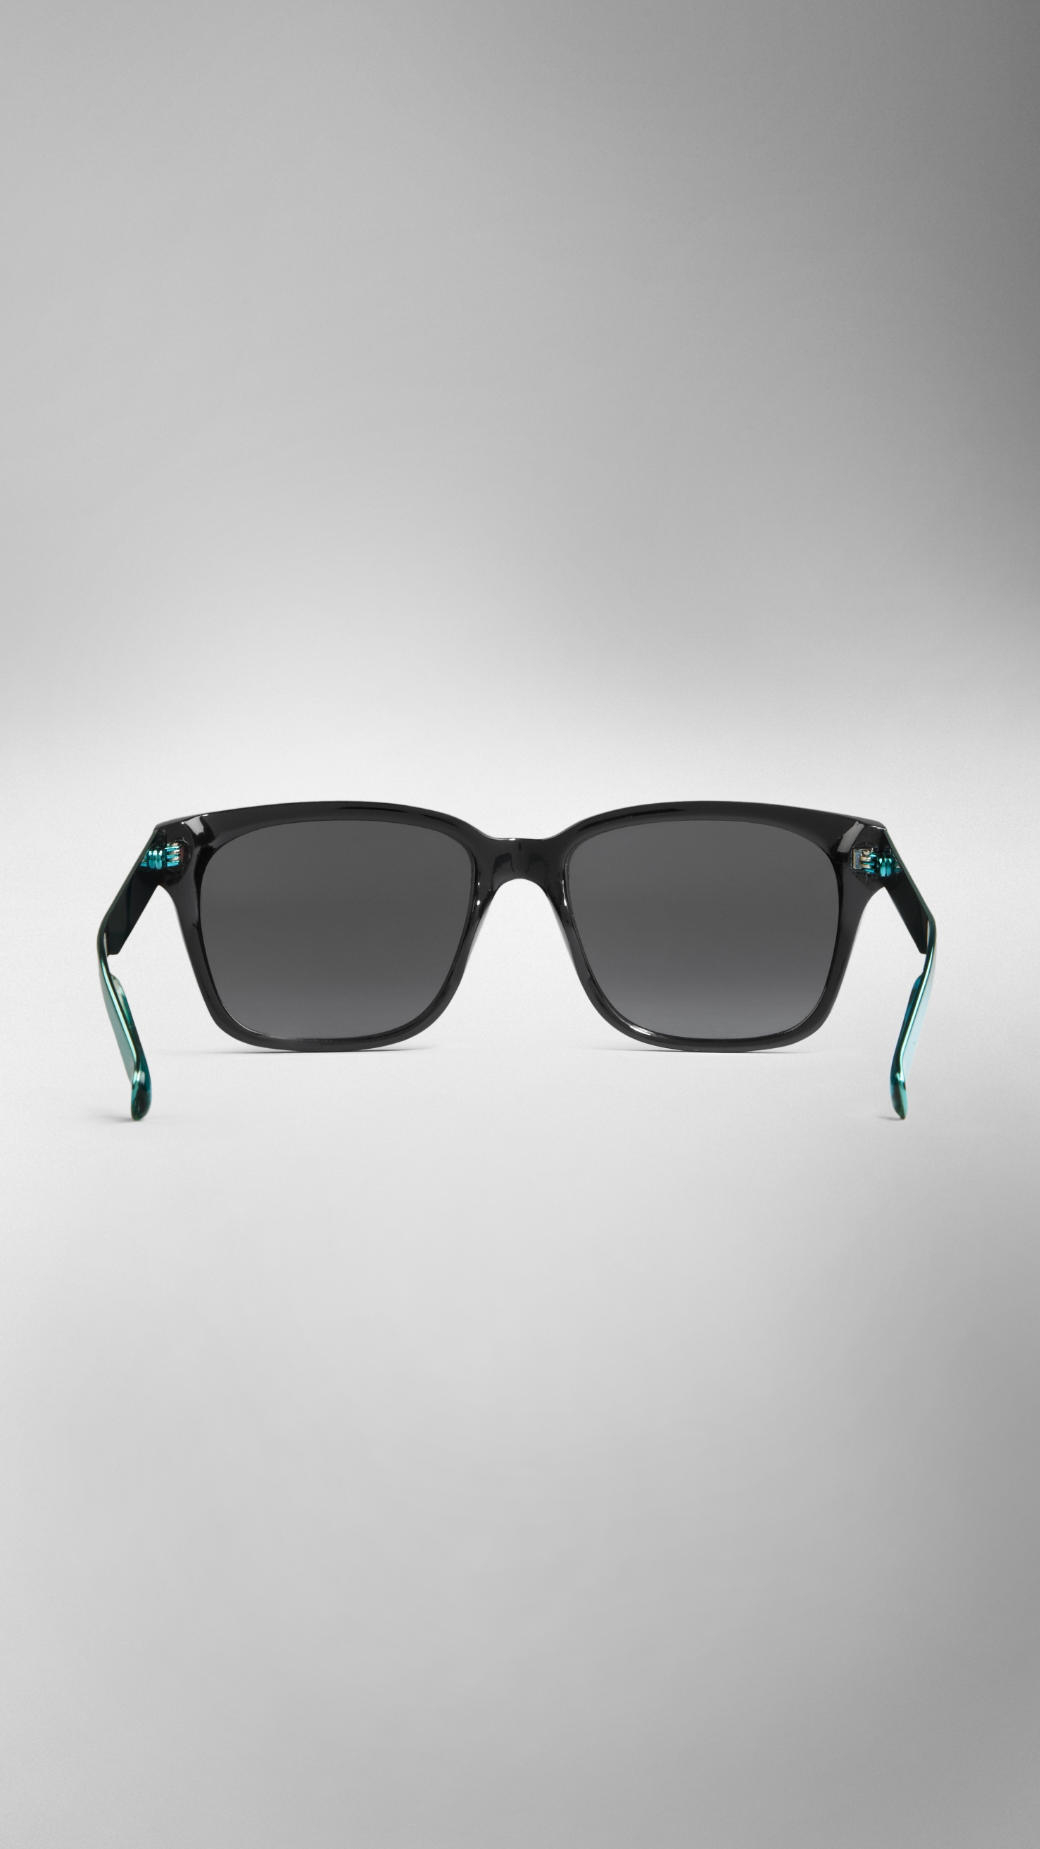 81a87d70c197 Lyst - Burberry Spark Square Frame Sunglasses in Black for Men